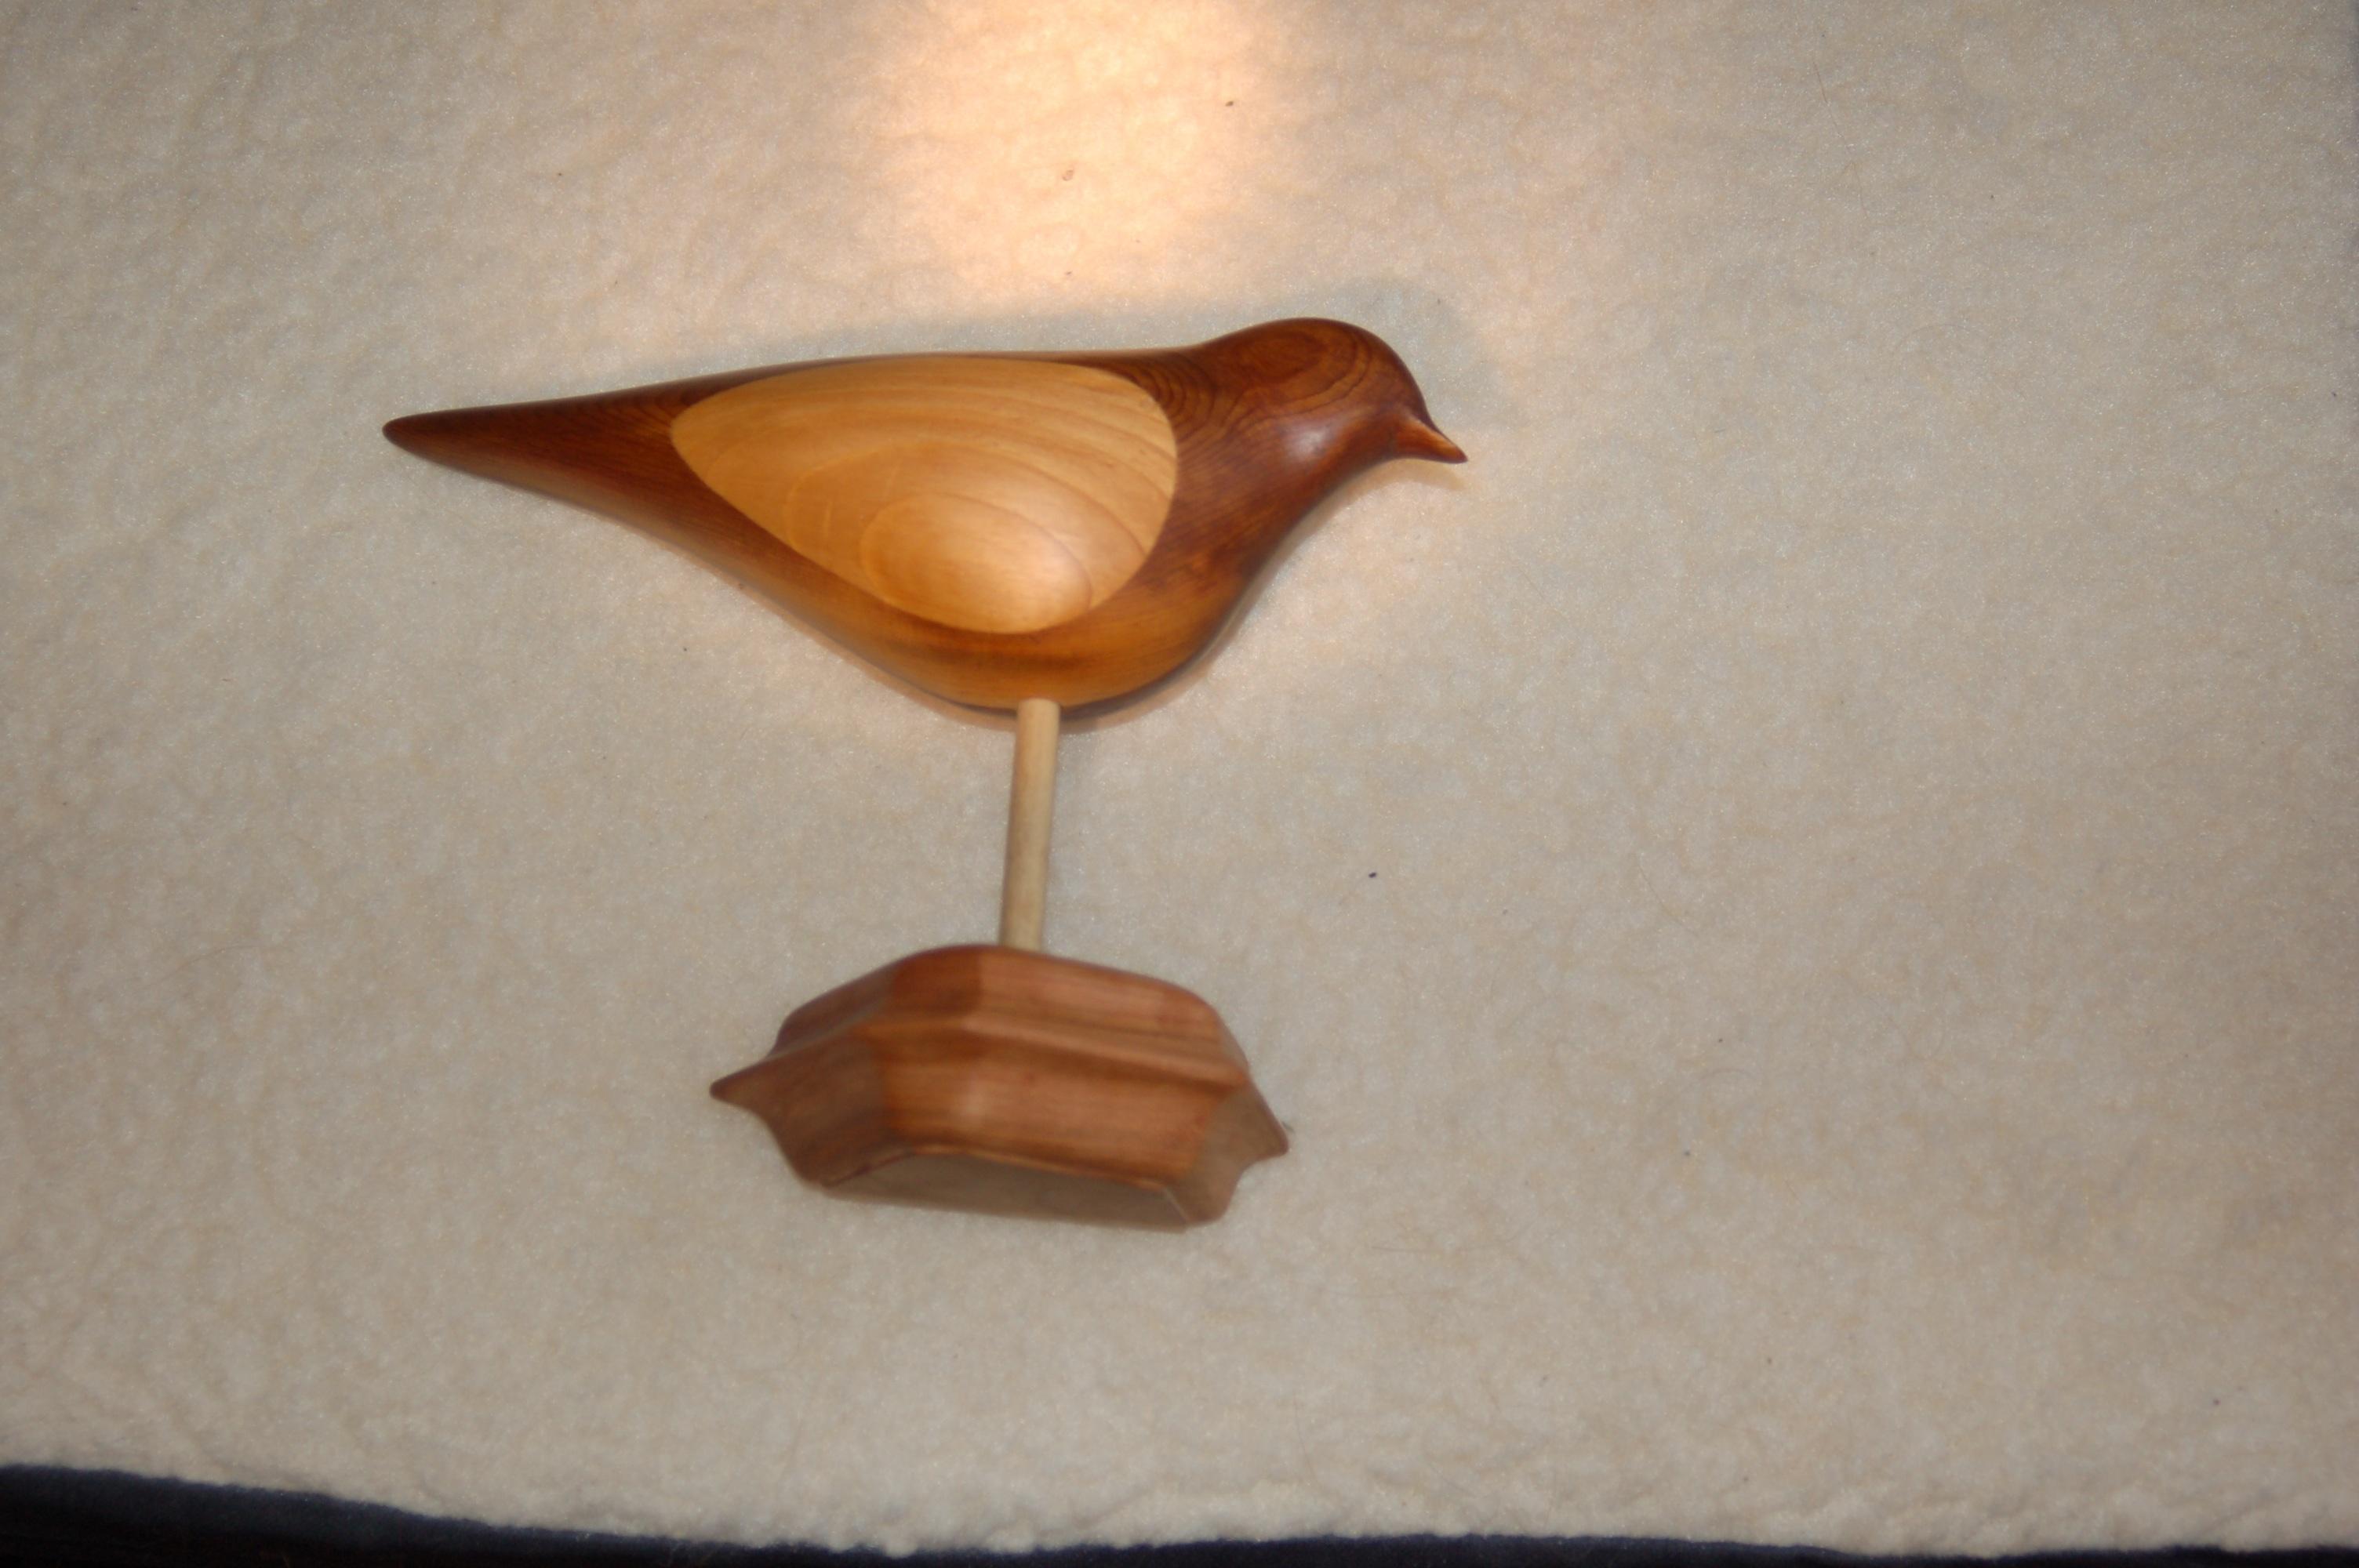 bill-brooks-bird-odie-s-oil-odie-s-wax-32413.jpg